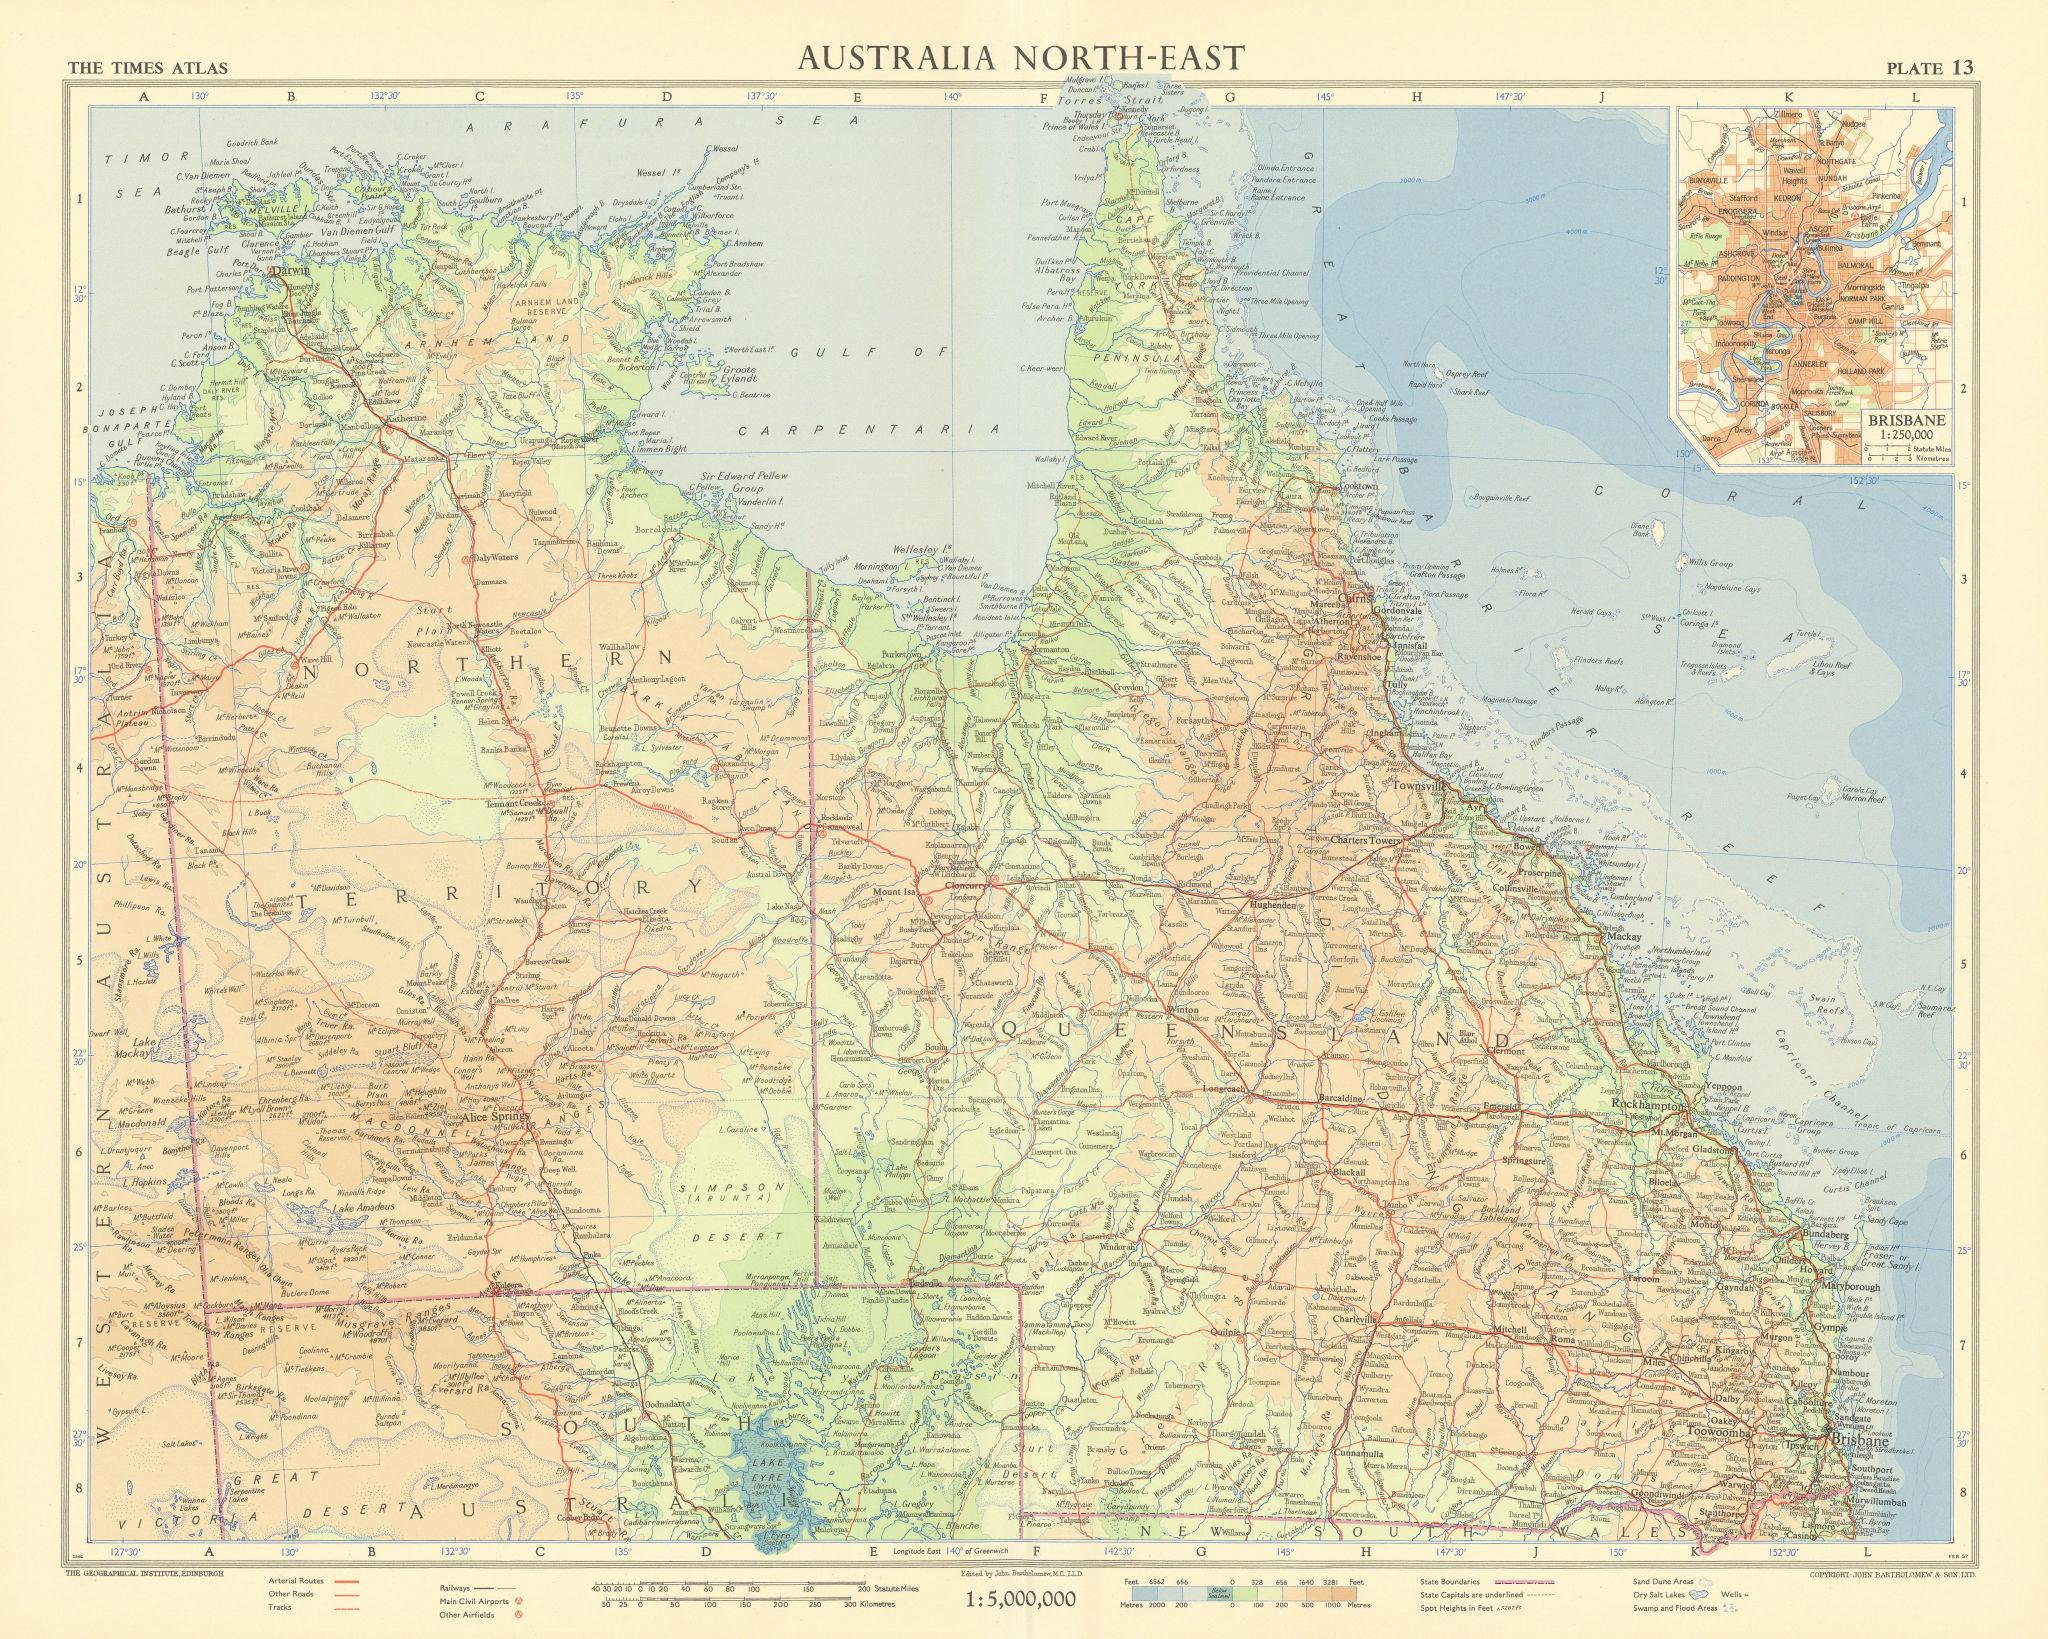 Australia NE. Queensland & Northern Territory. Brisbane plan. TIMES 1958 map